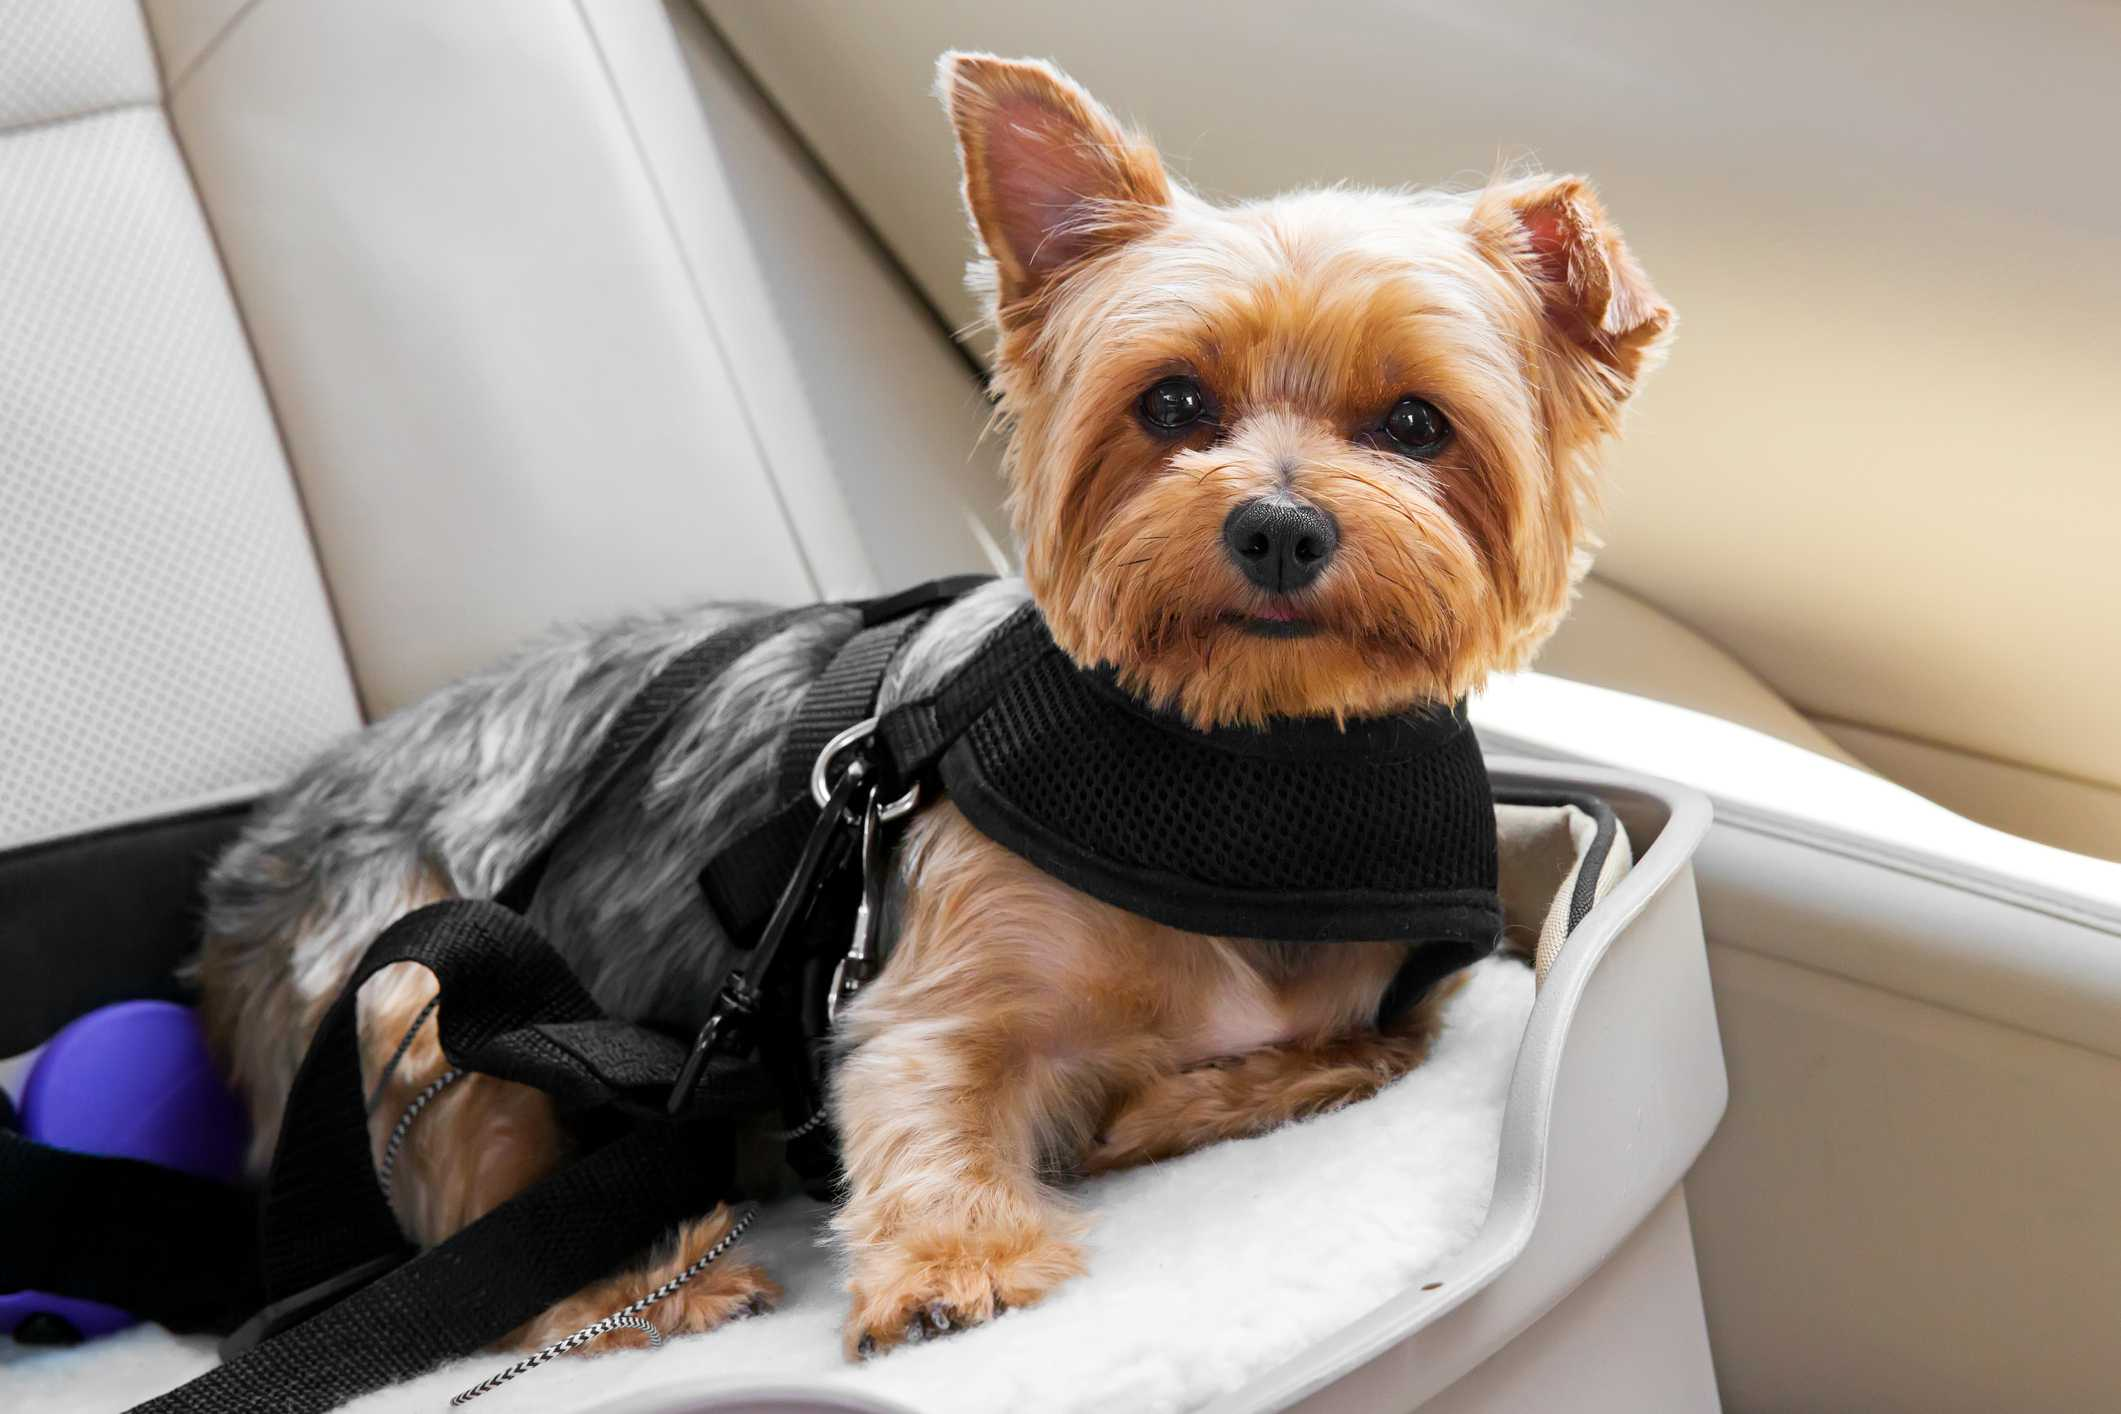 Dog in a car seat.